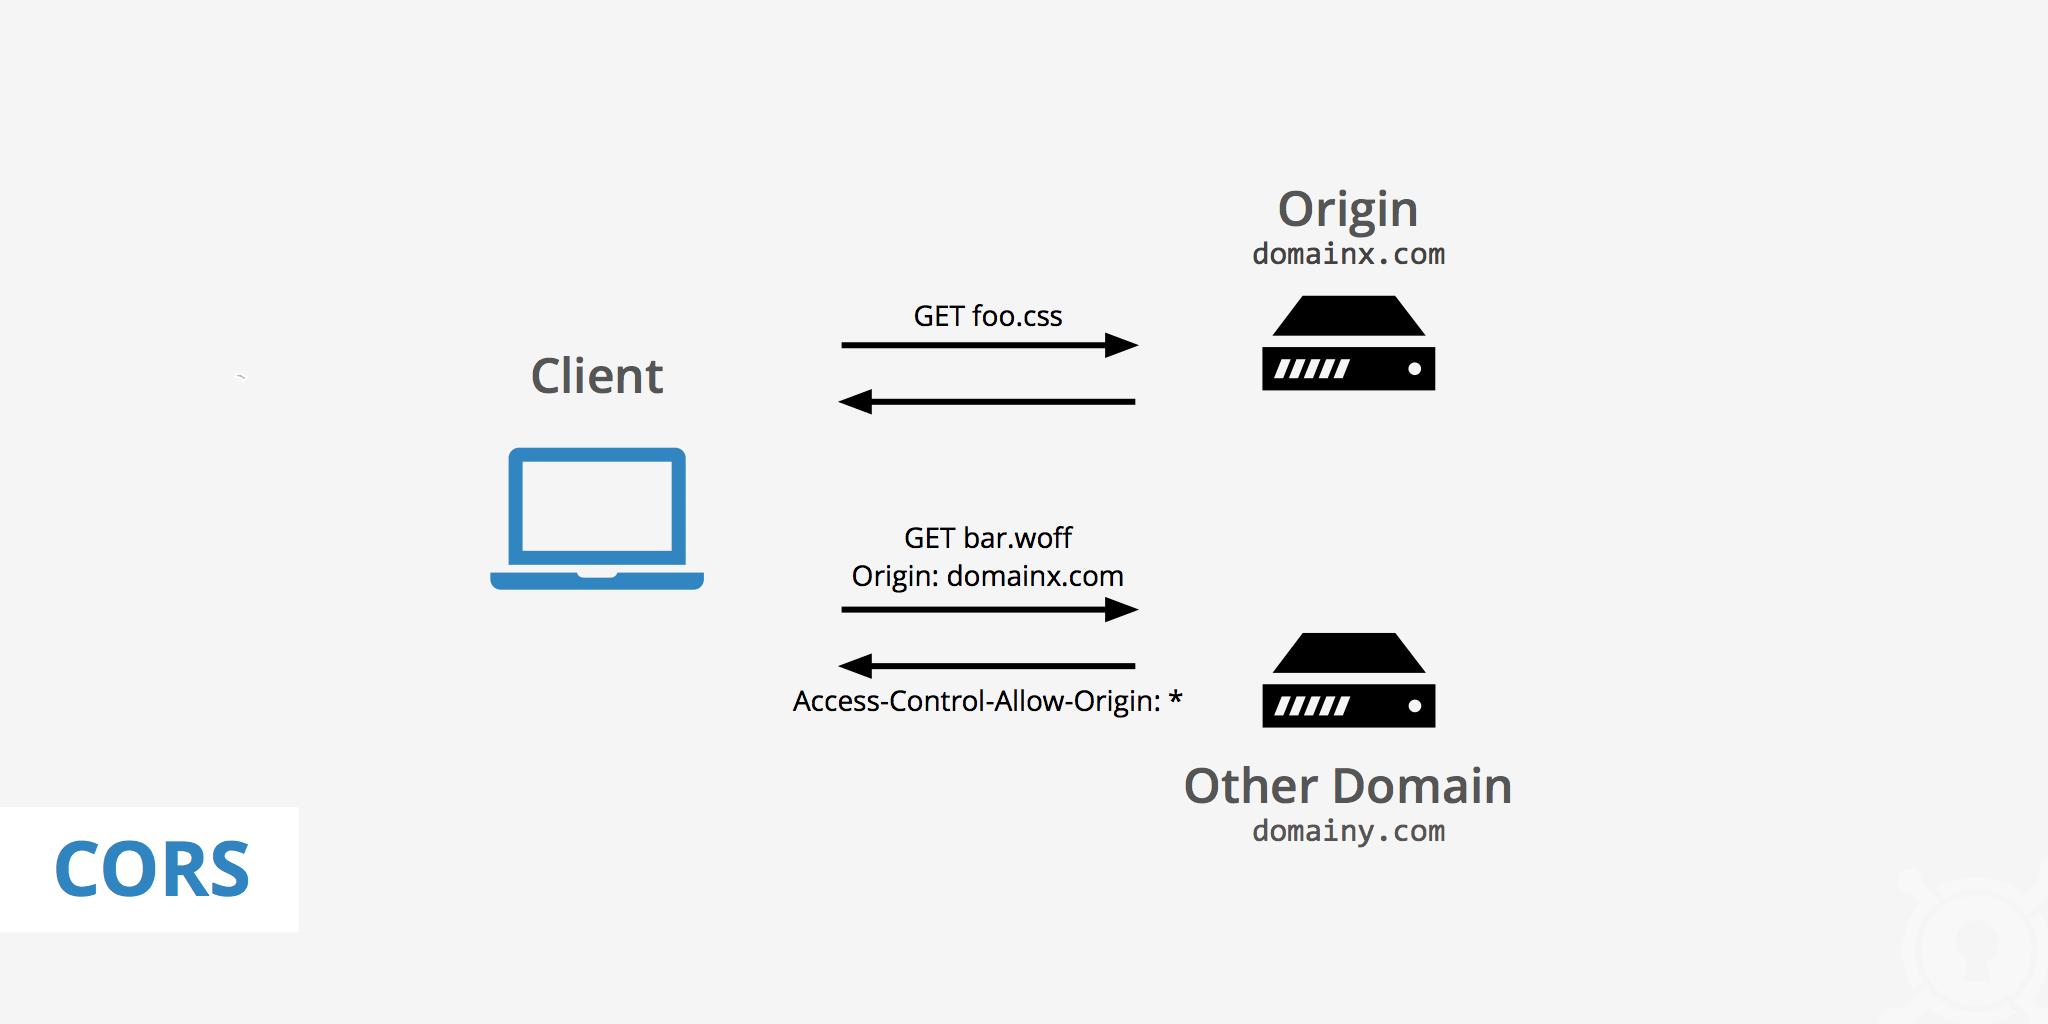 No Access-Control-Allow-Origin 跨域错误解决